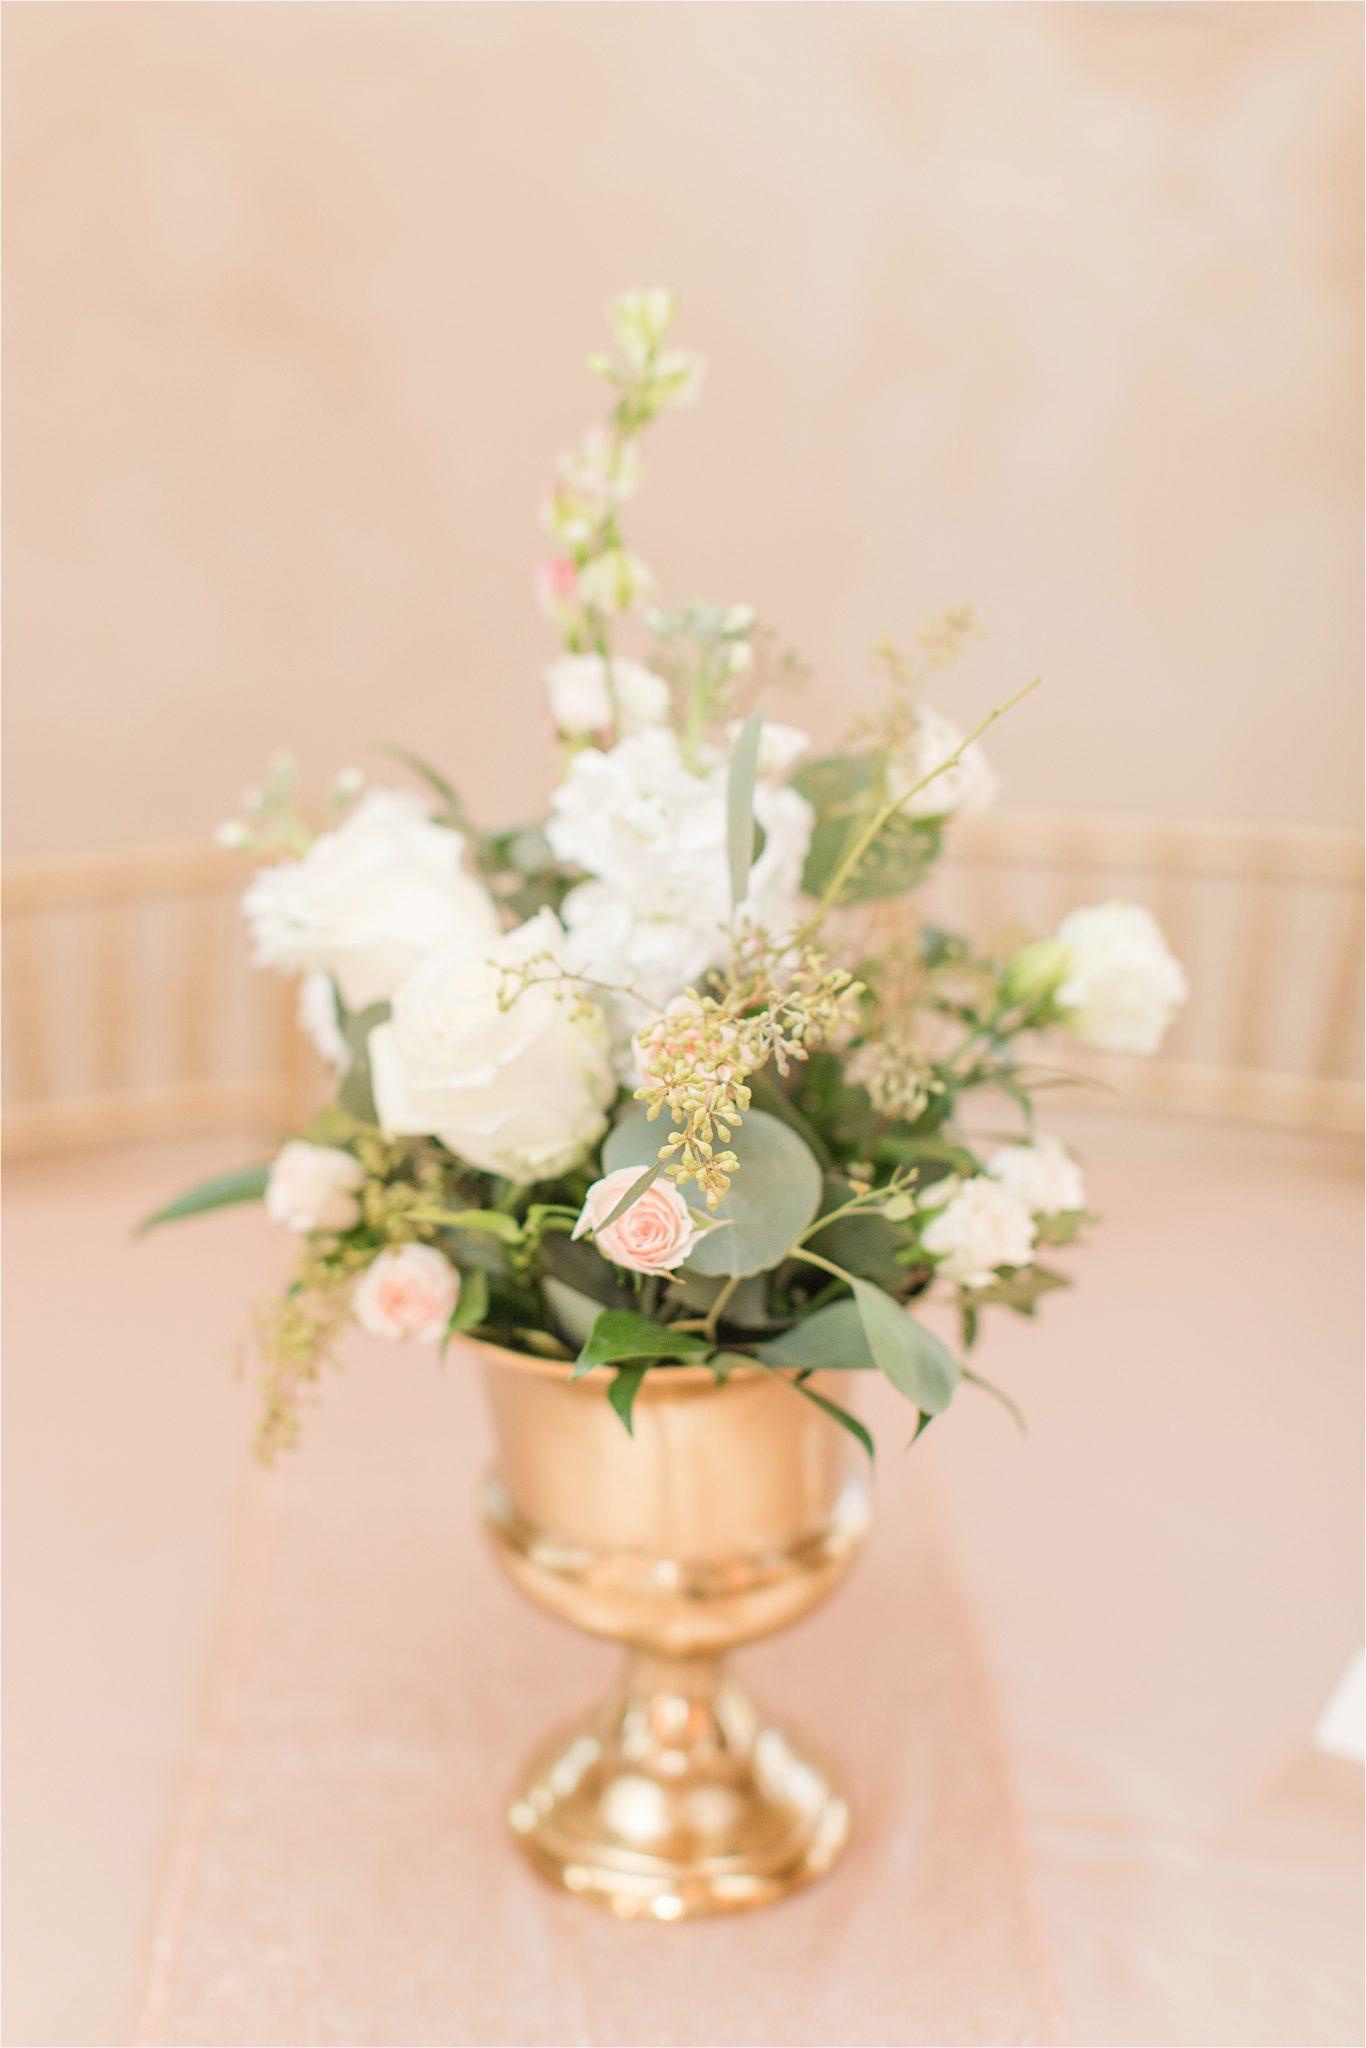 The Barn at Bridlewood Wedding-Hattiesburg, Mississippi-Kelsey + Blake-Wedding details-Barn wedding-Ruby wedding-Autumn themed wedding-Wedding detail-Wedding reception-Wedding centerpieces-Wedding florals